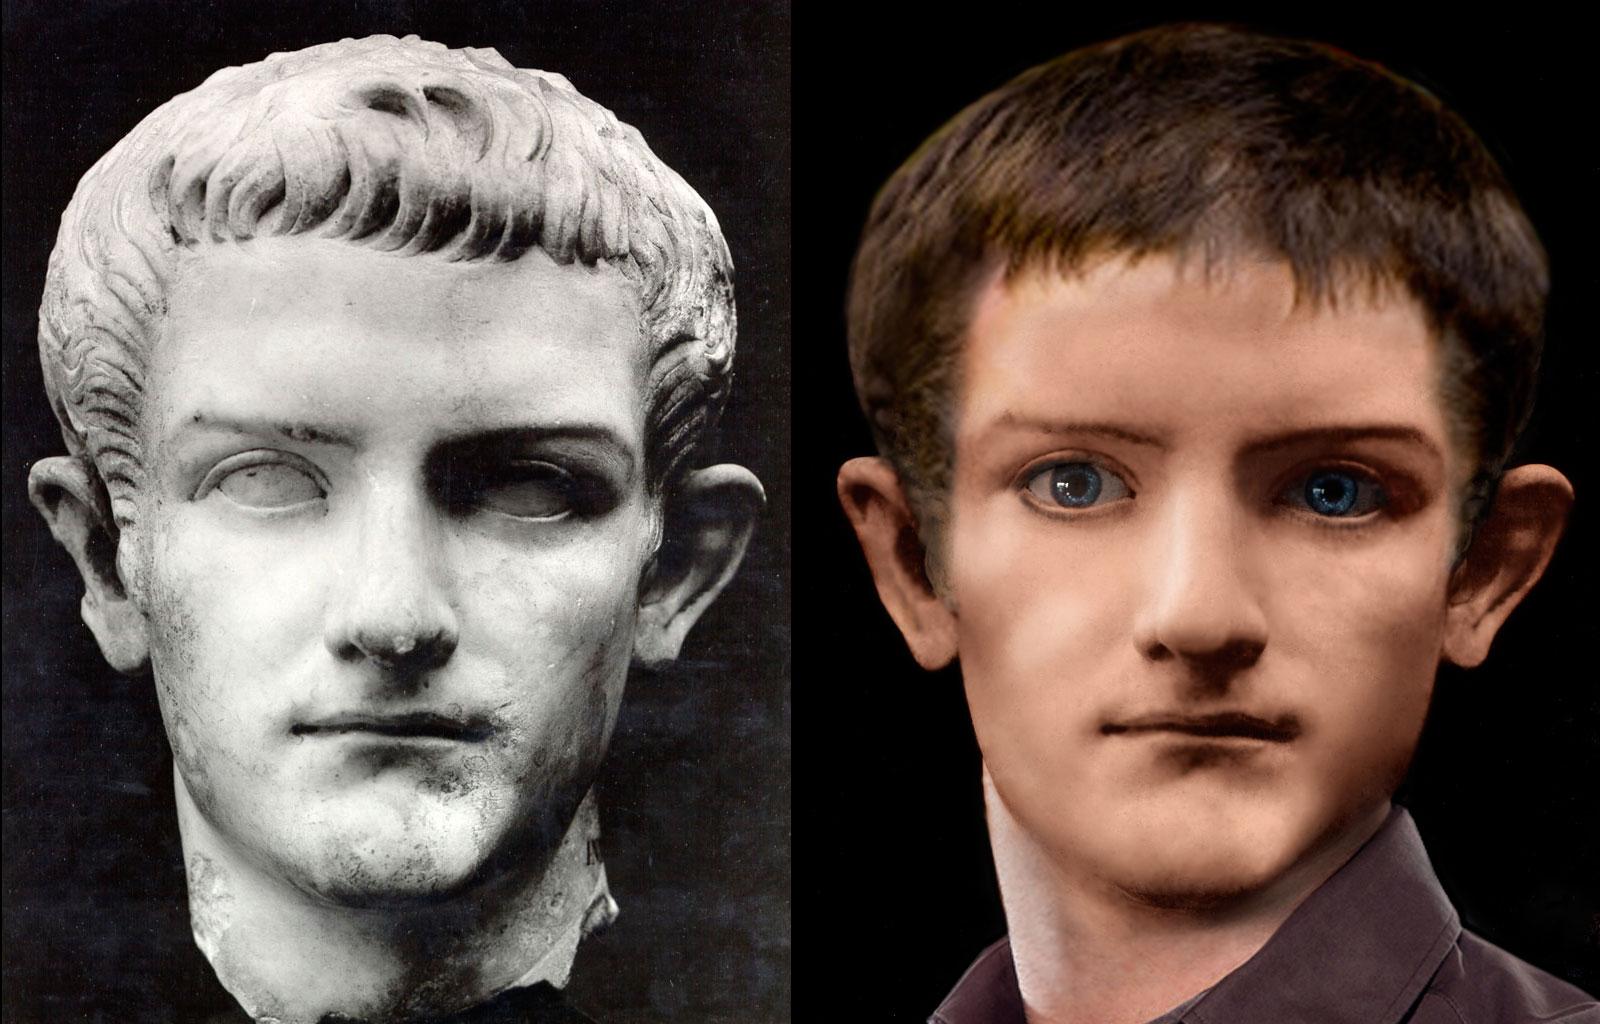 http://3.bp.blogspot.com/_yrHR_xt0EN4/TAjUvMIMweI/AAAAAAAAHS0/CouA1azXUG8/s1600/Caligula.jpg